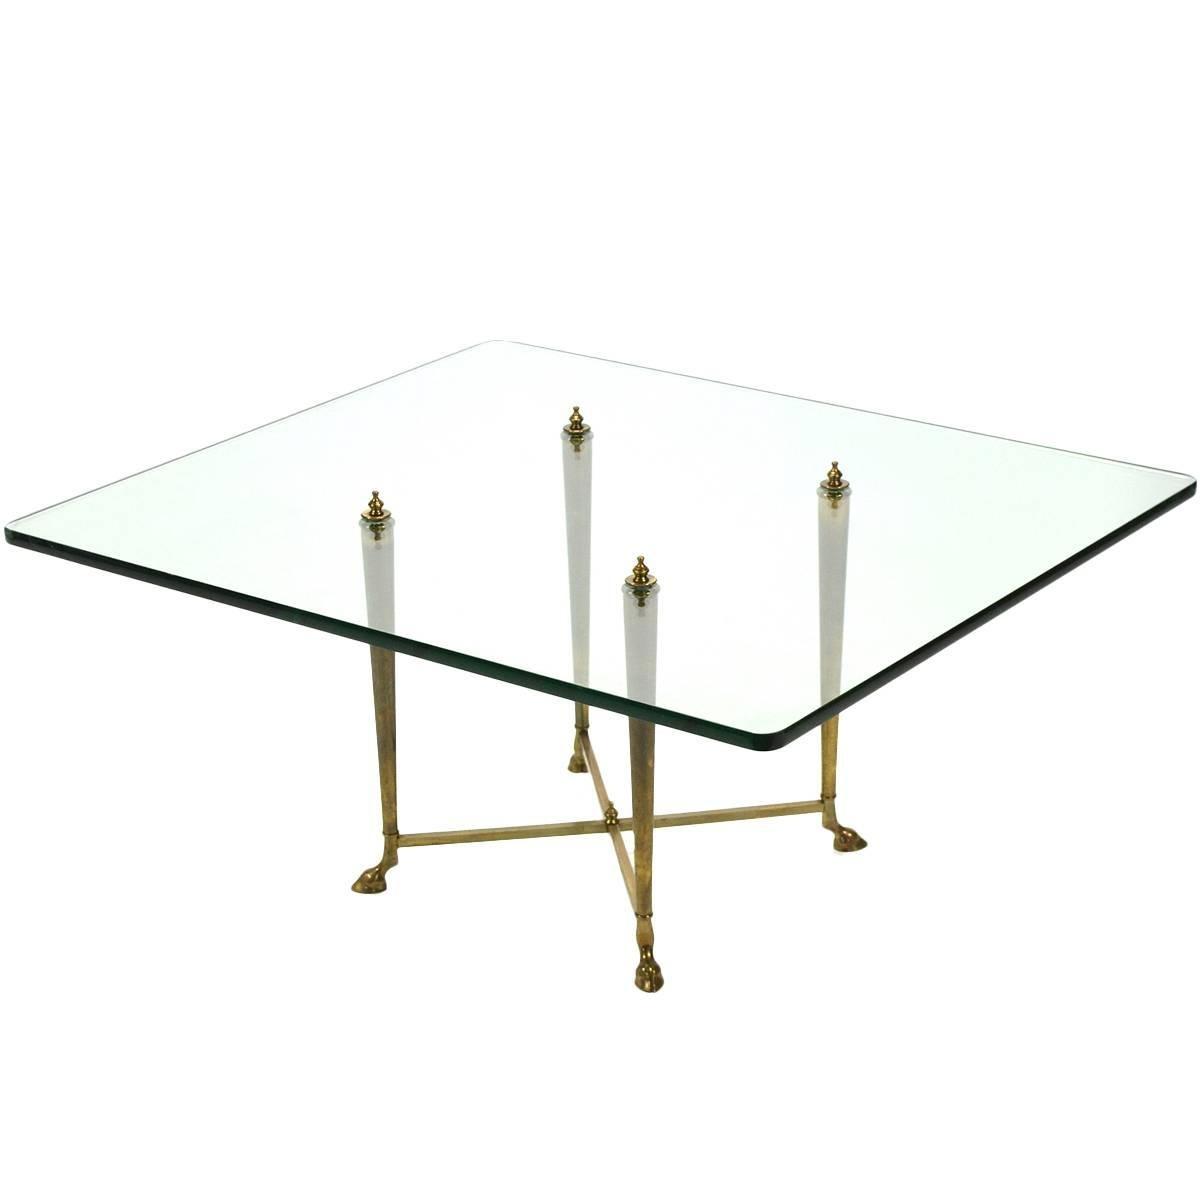 Italian Glass Top Coffee Table with Brass Hoof Base